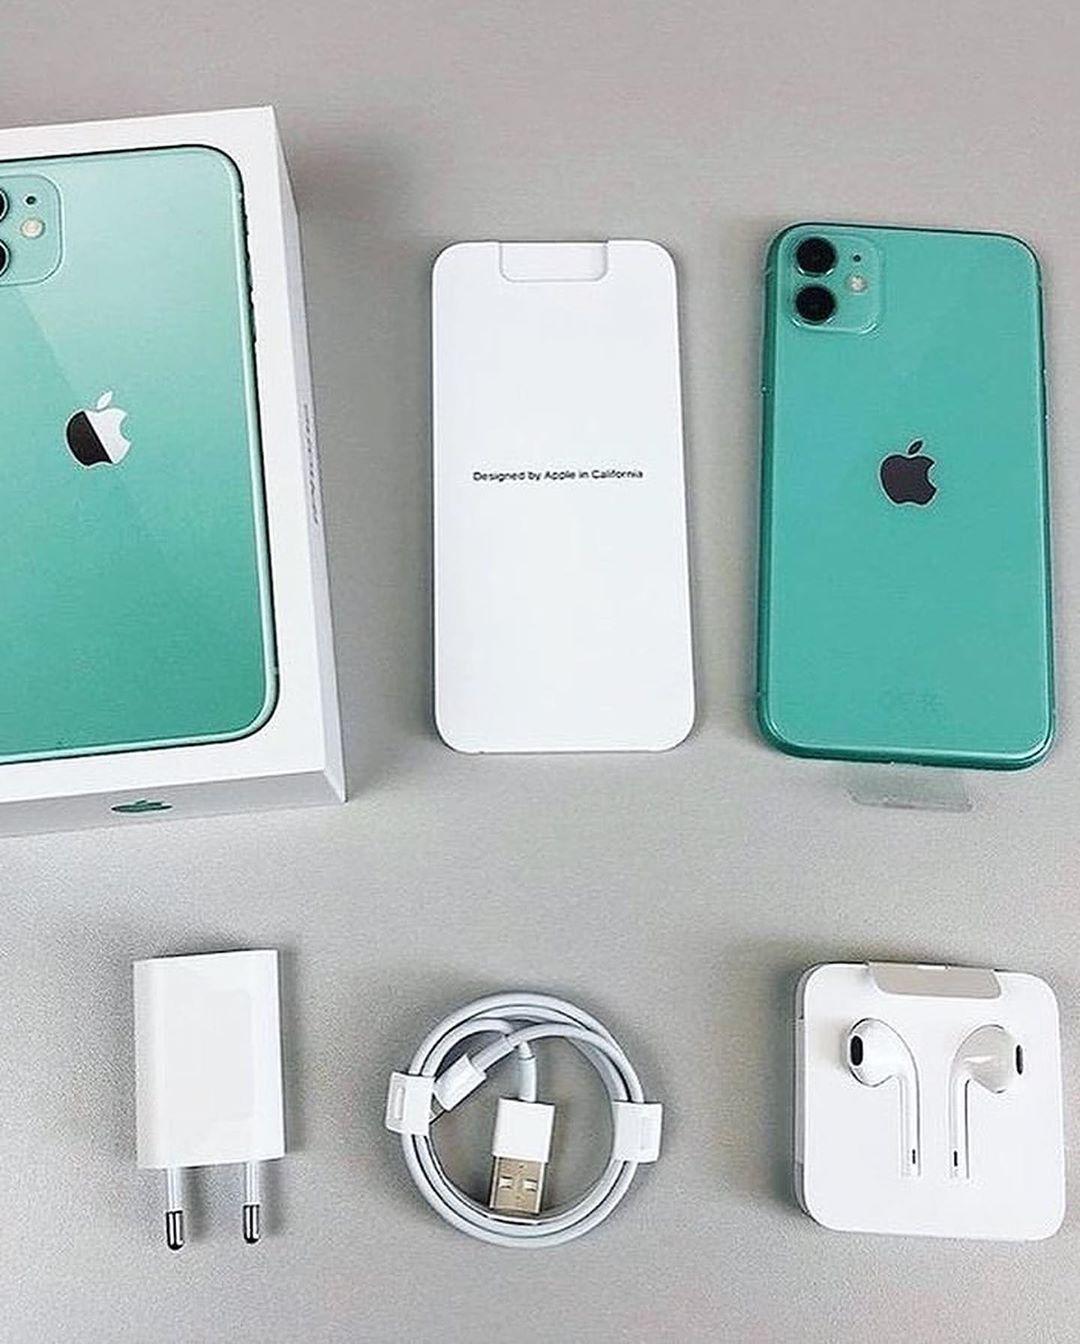 iphone 11 wallpaper iphone 11 pro iphone 11 2019 apple